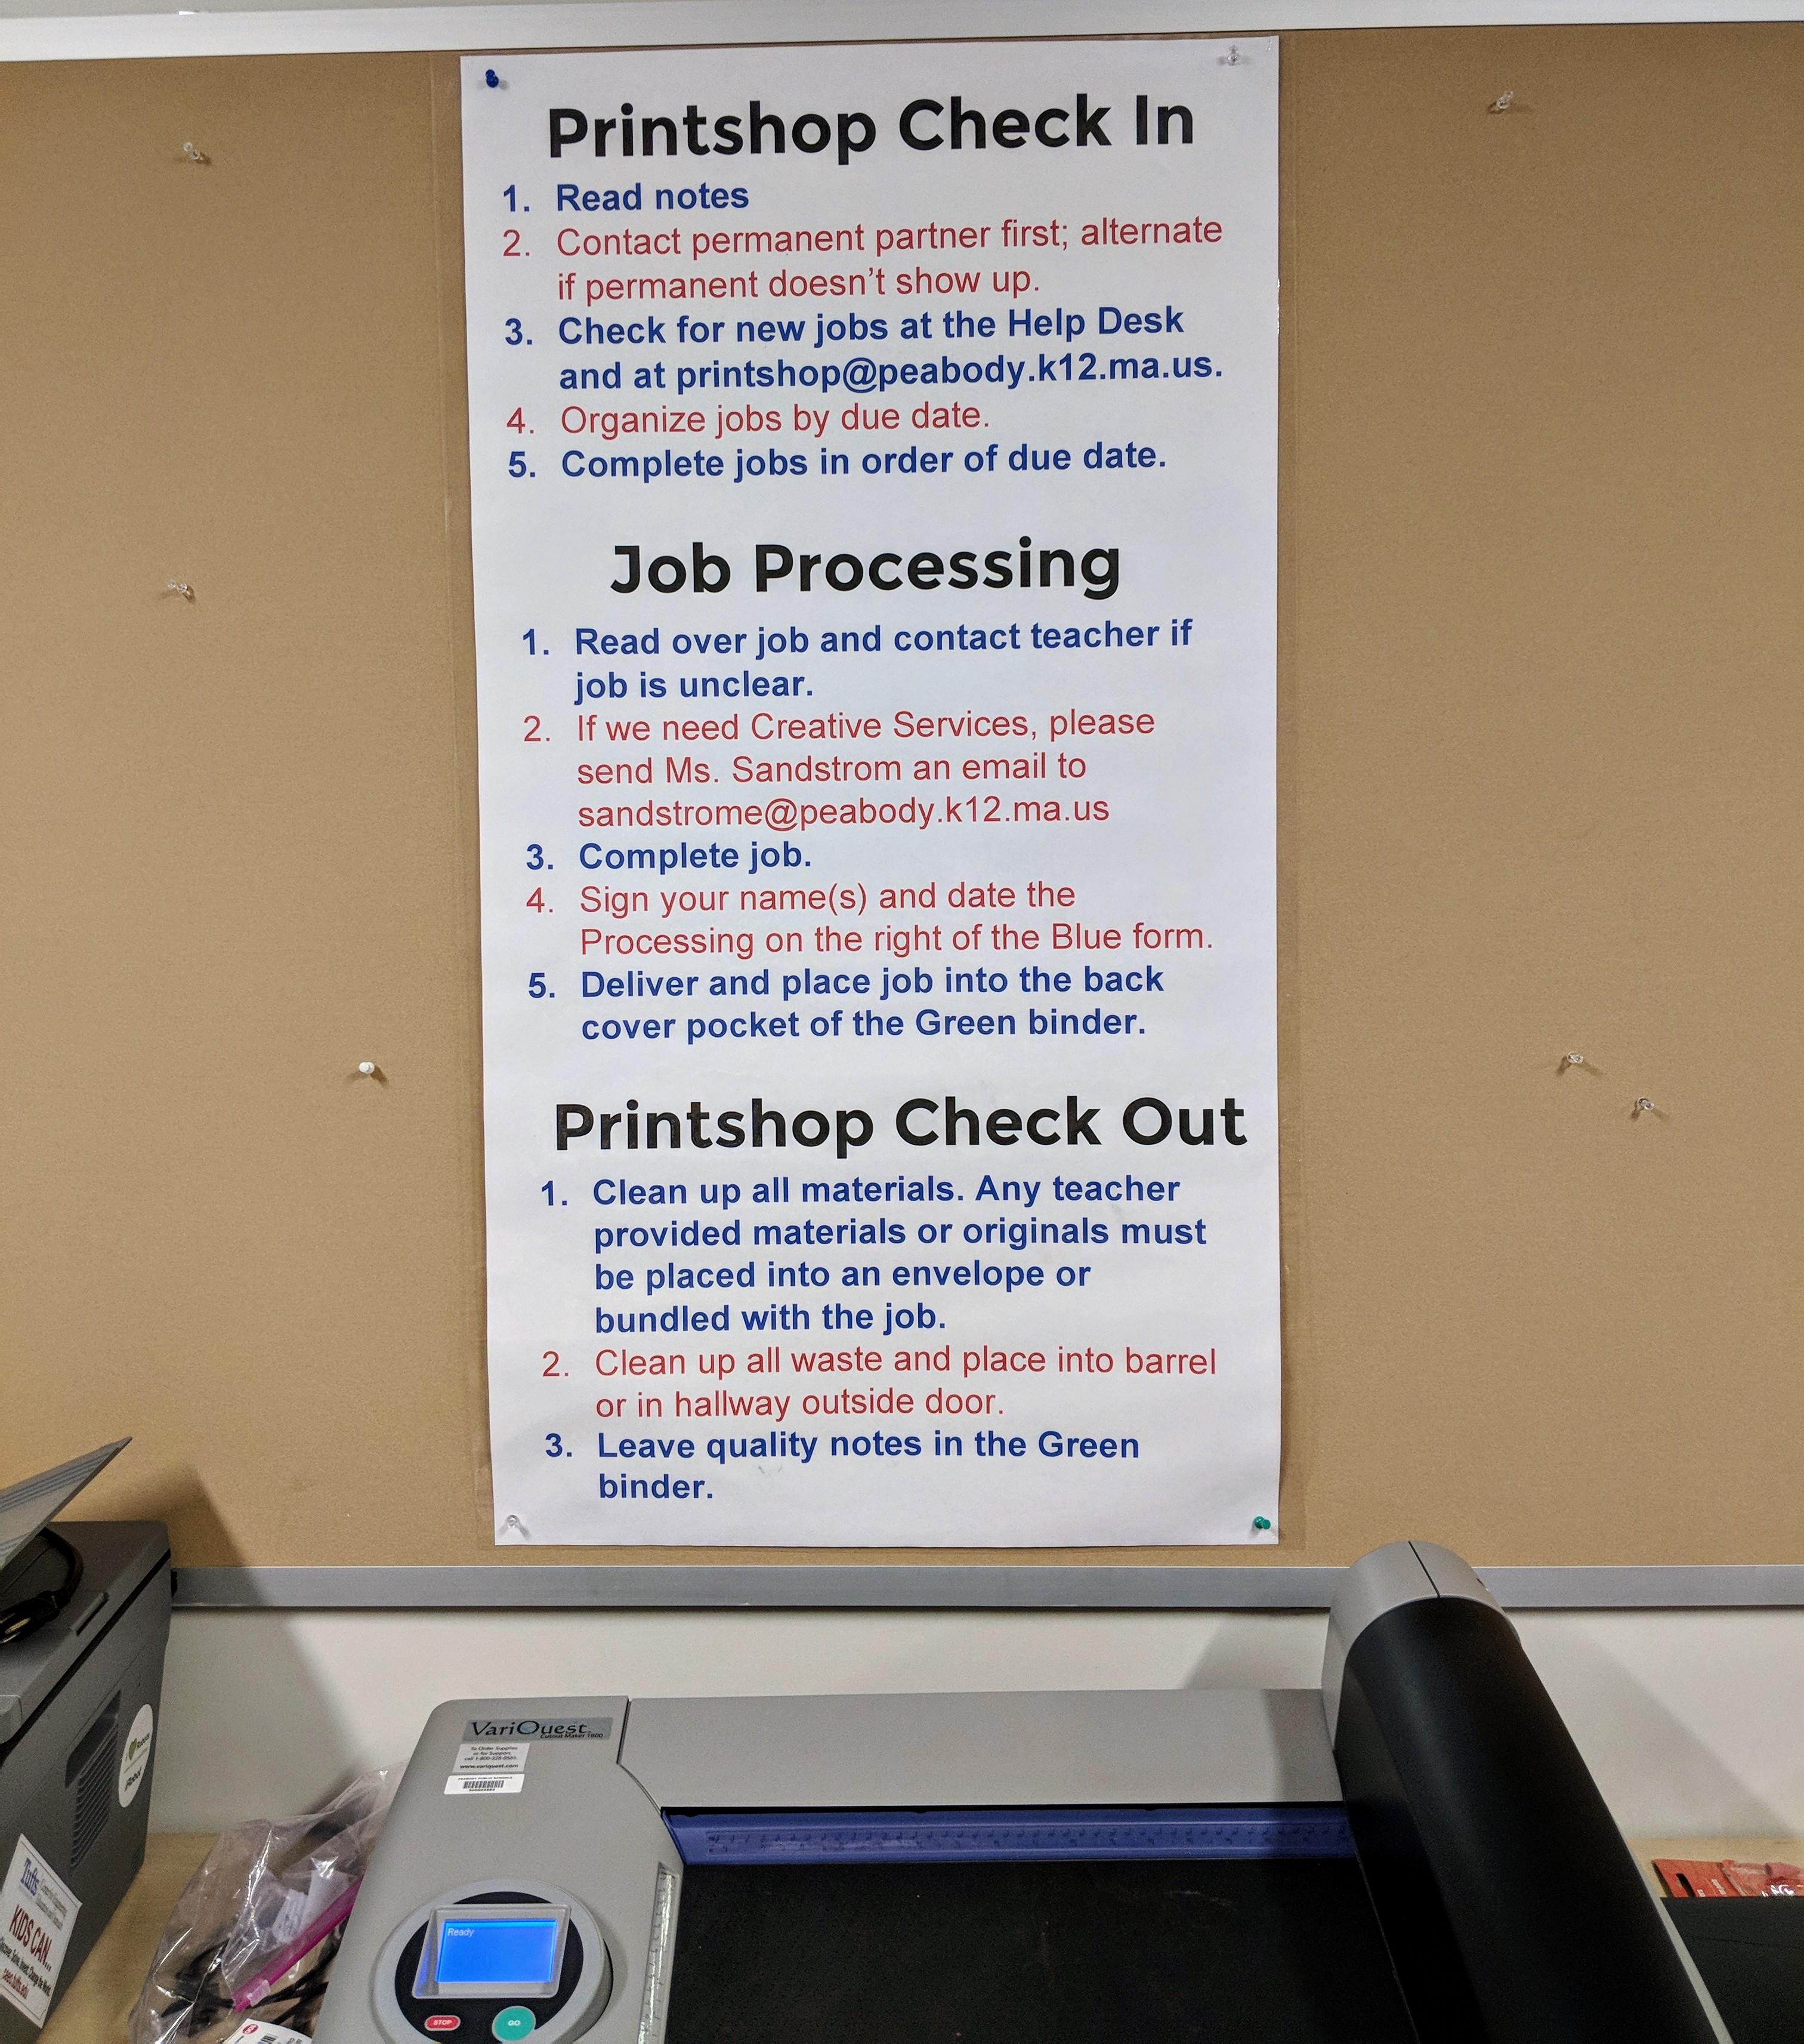 higgins middle school printshop poster Counts VariQuest tools